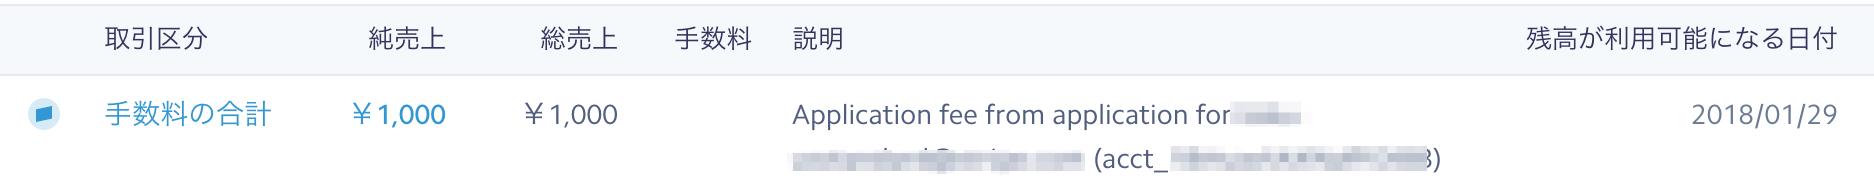 Platform_ApplicationFee.png